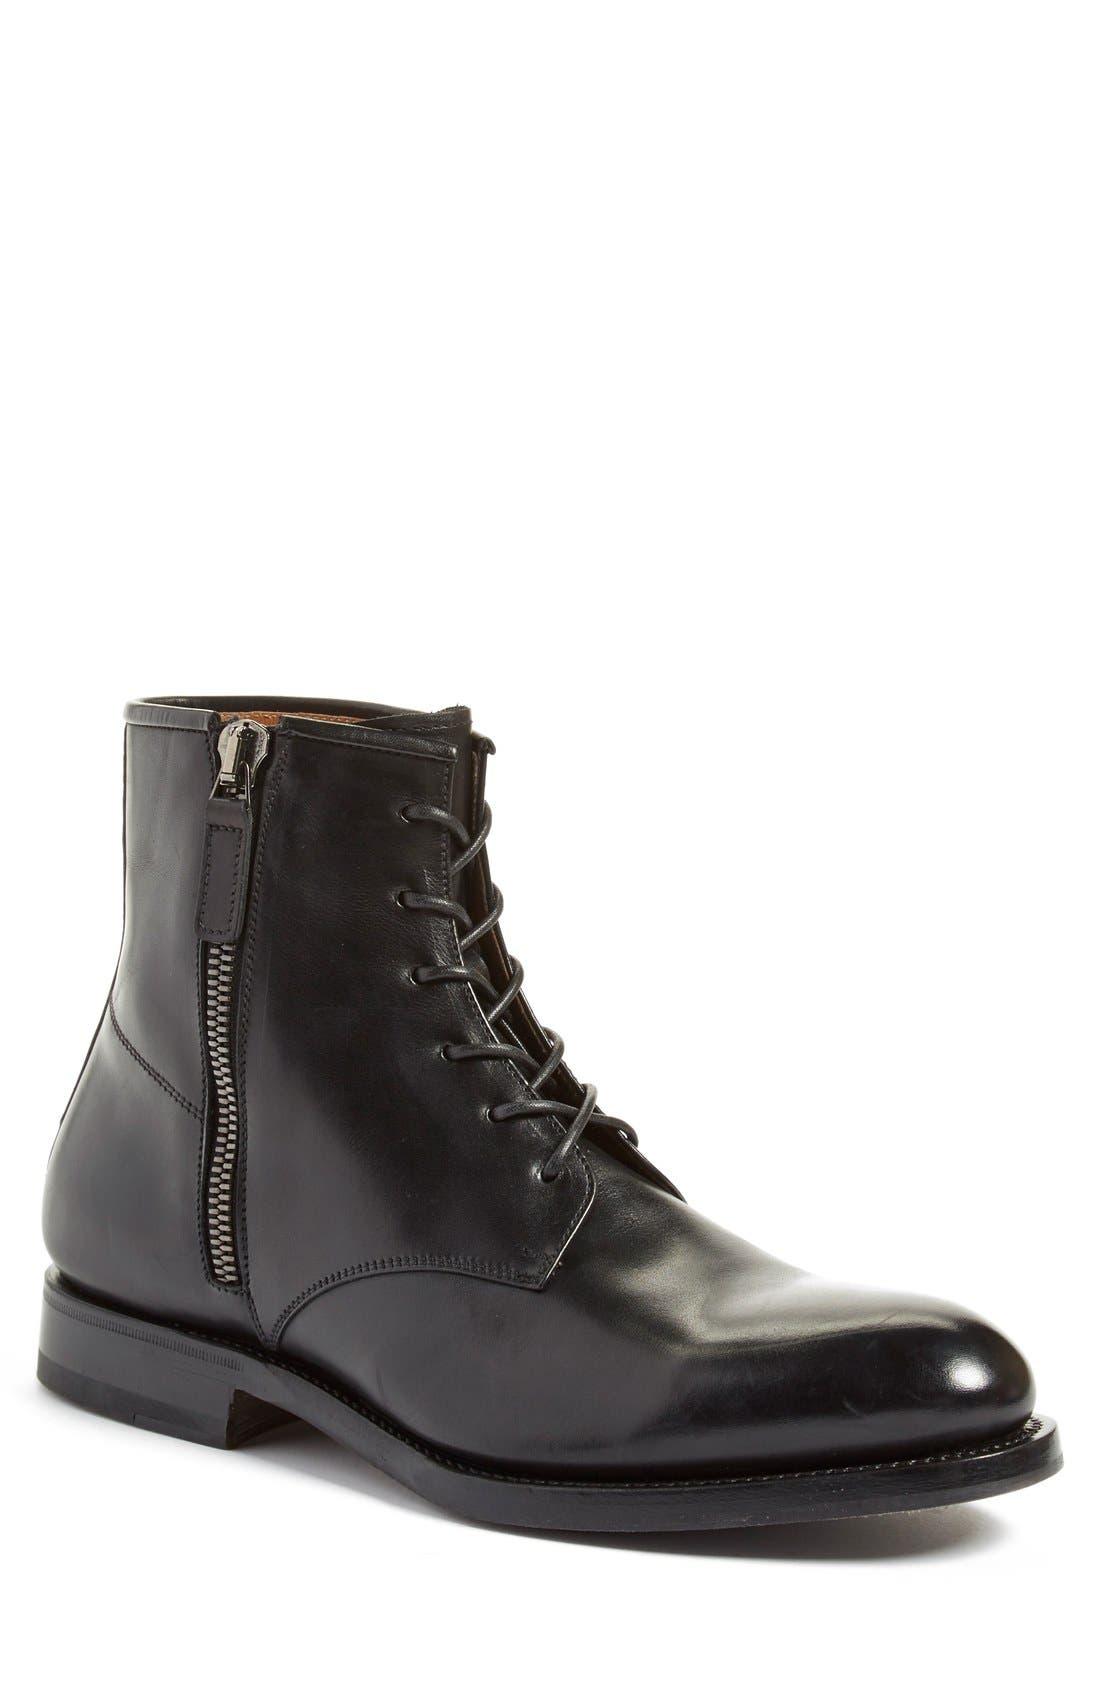 Alternate Image 1 Selected - Aquatalia 'Victor' Plain Toe Boot (Men)